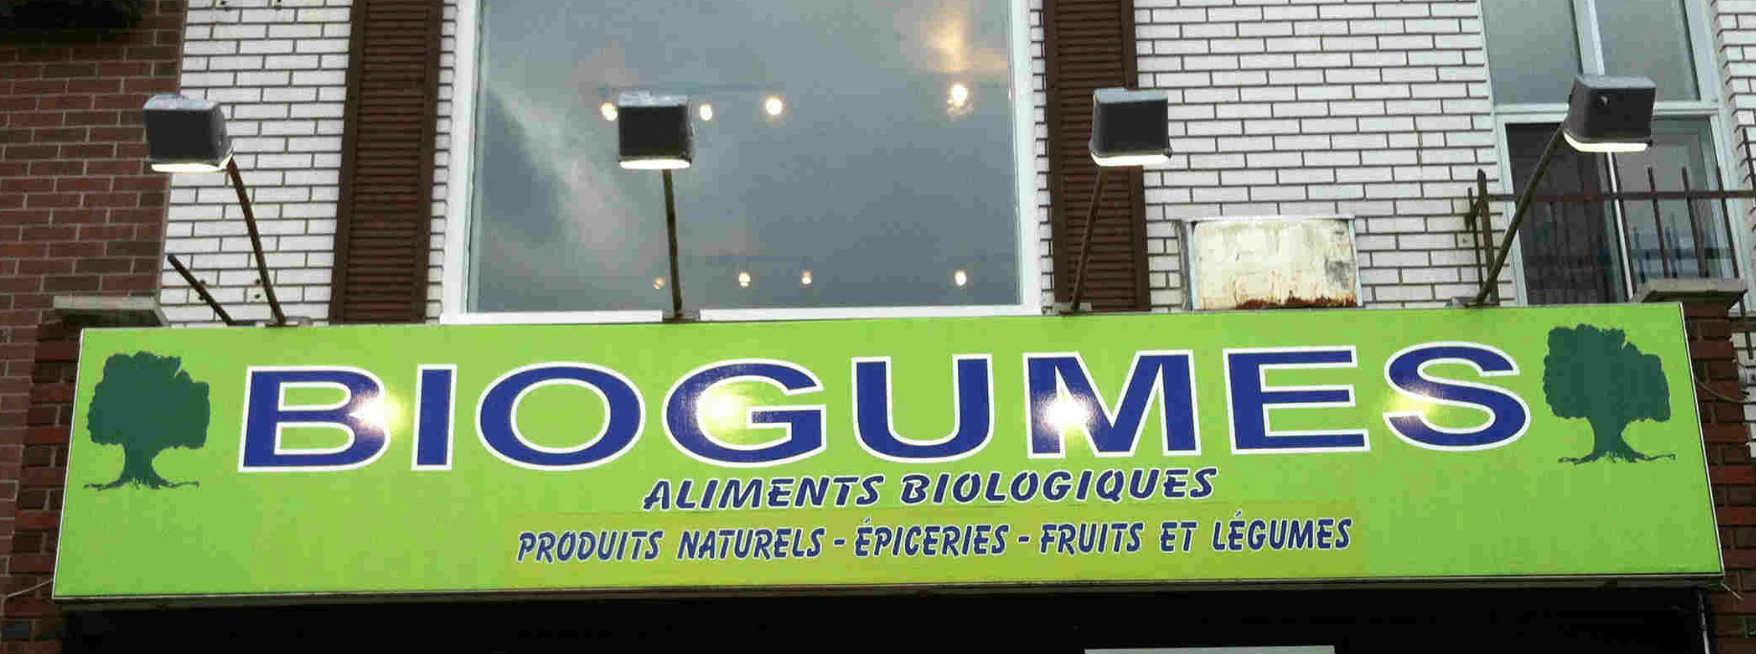 Des légumes bio ?